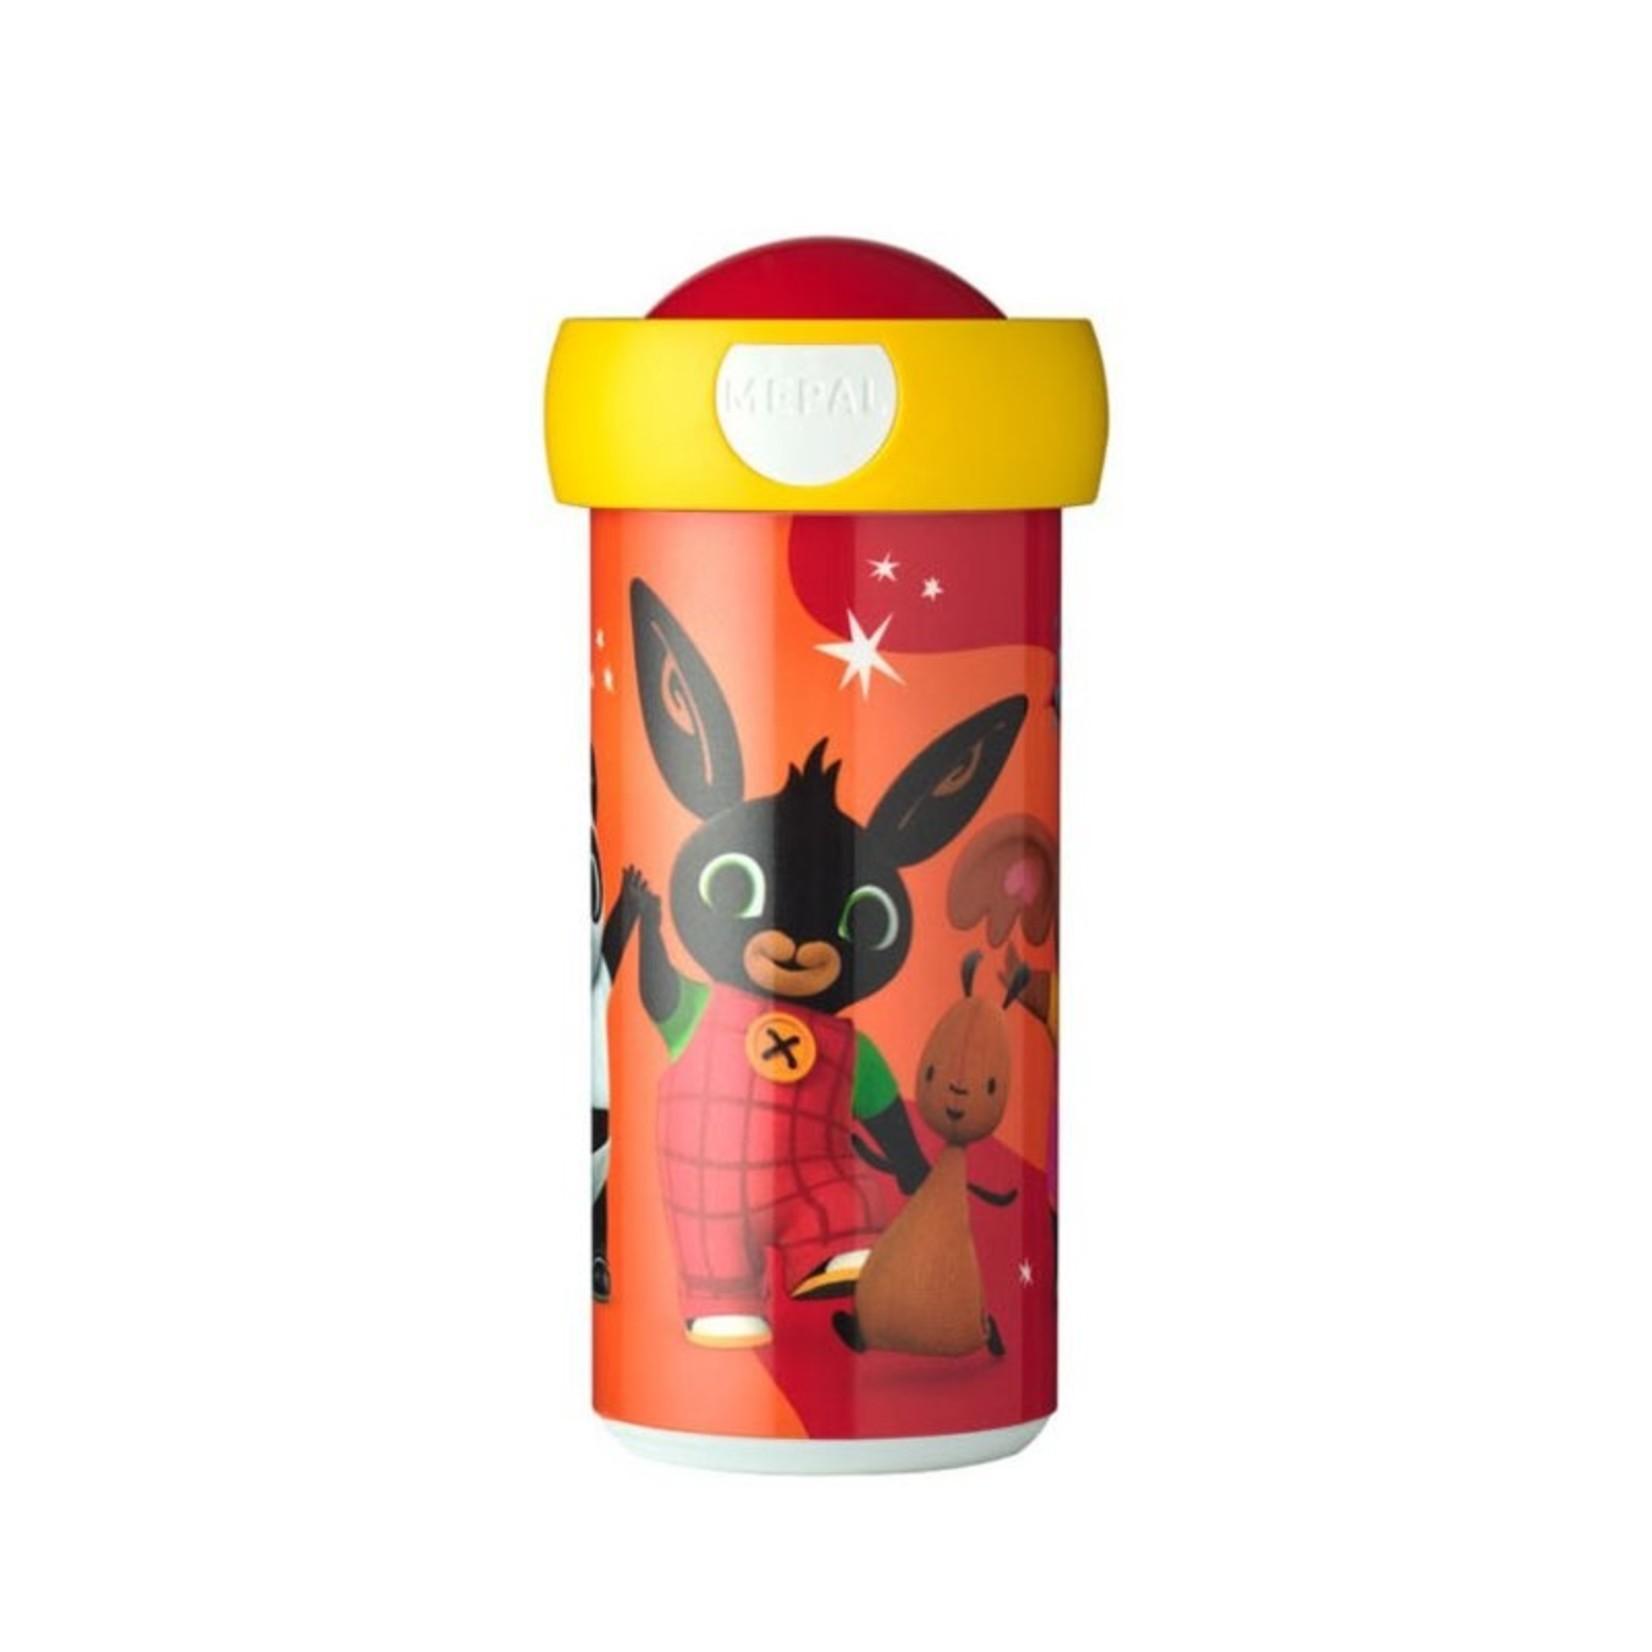 Mepal Bing Drinkbeker - Mepal